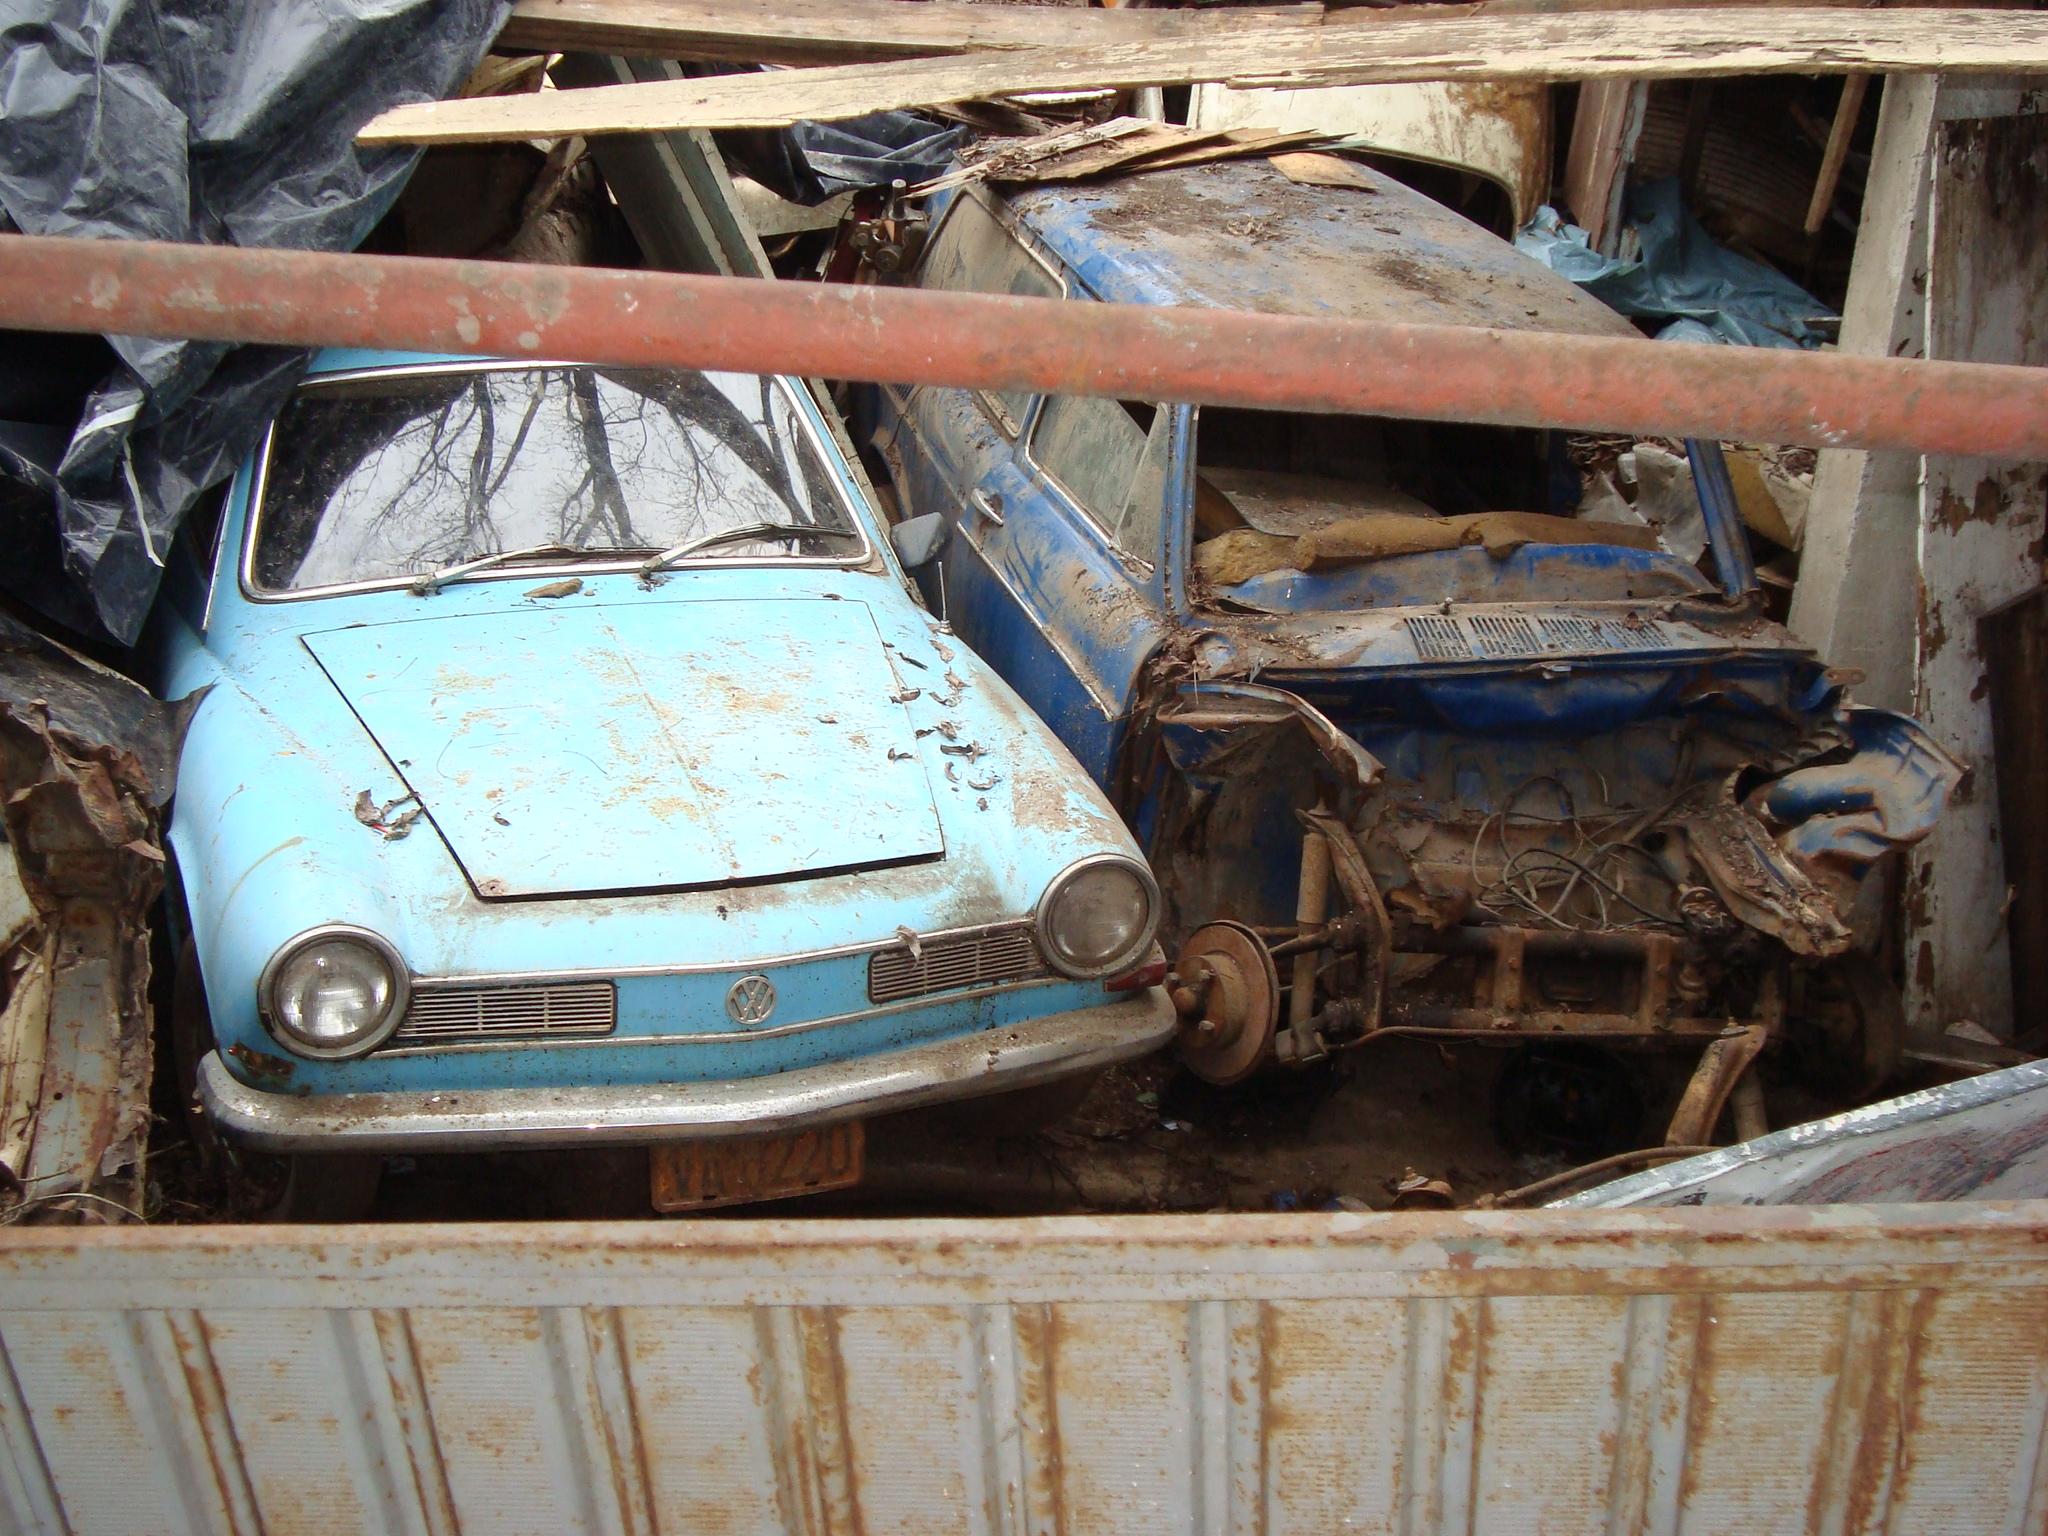 rafinha-kg VW Karmann Ghia e VW Variant - um resgate!